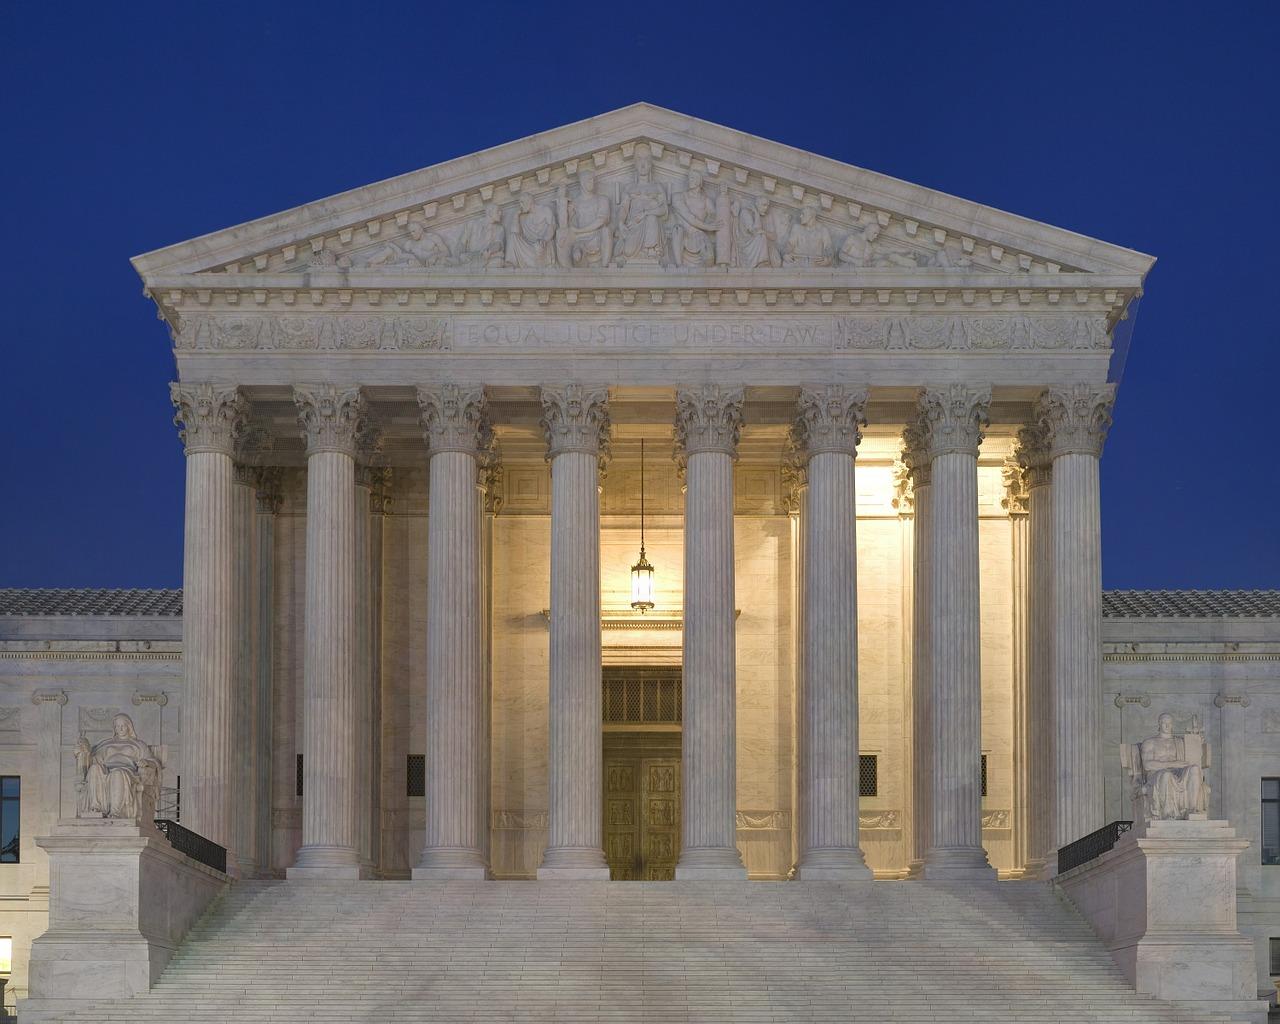 Image of Supreme Court